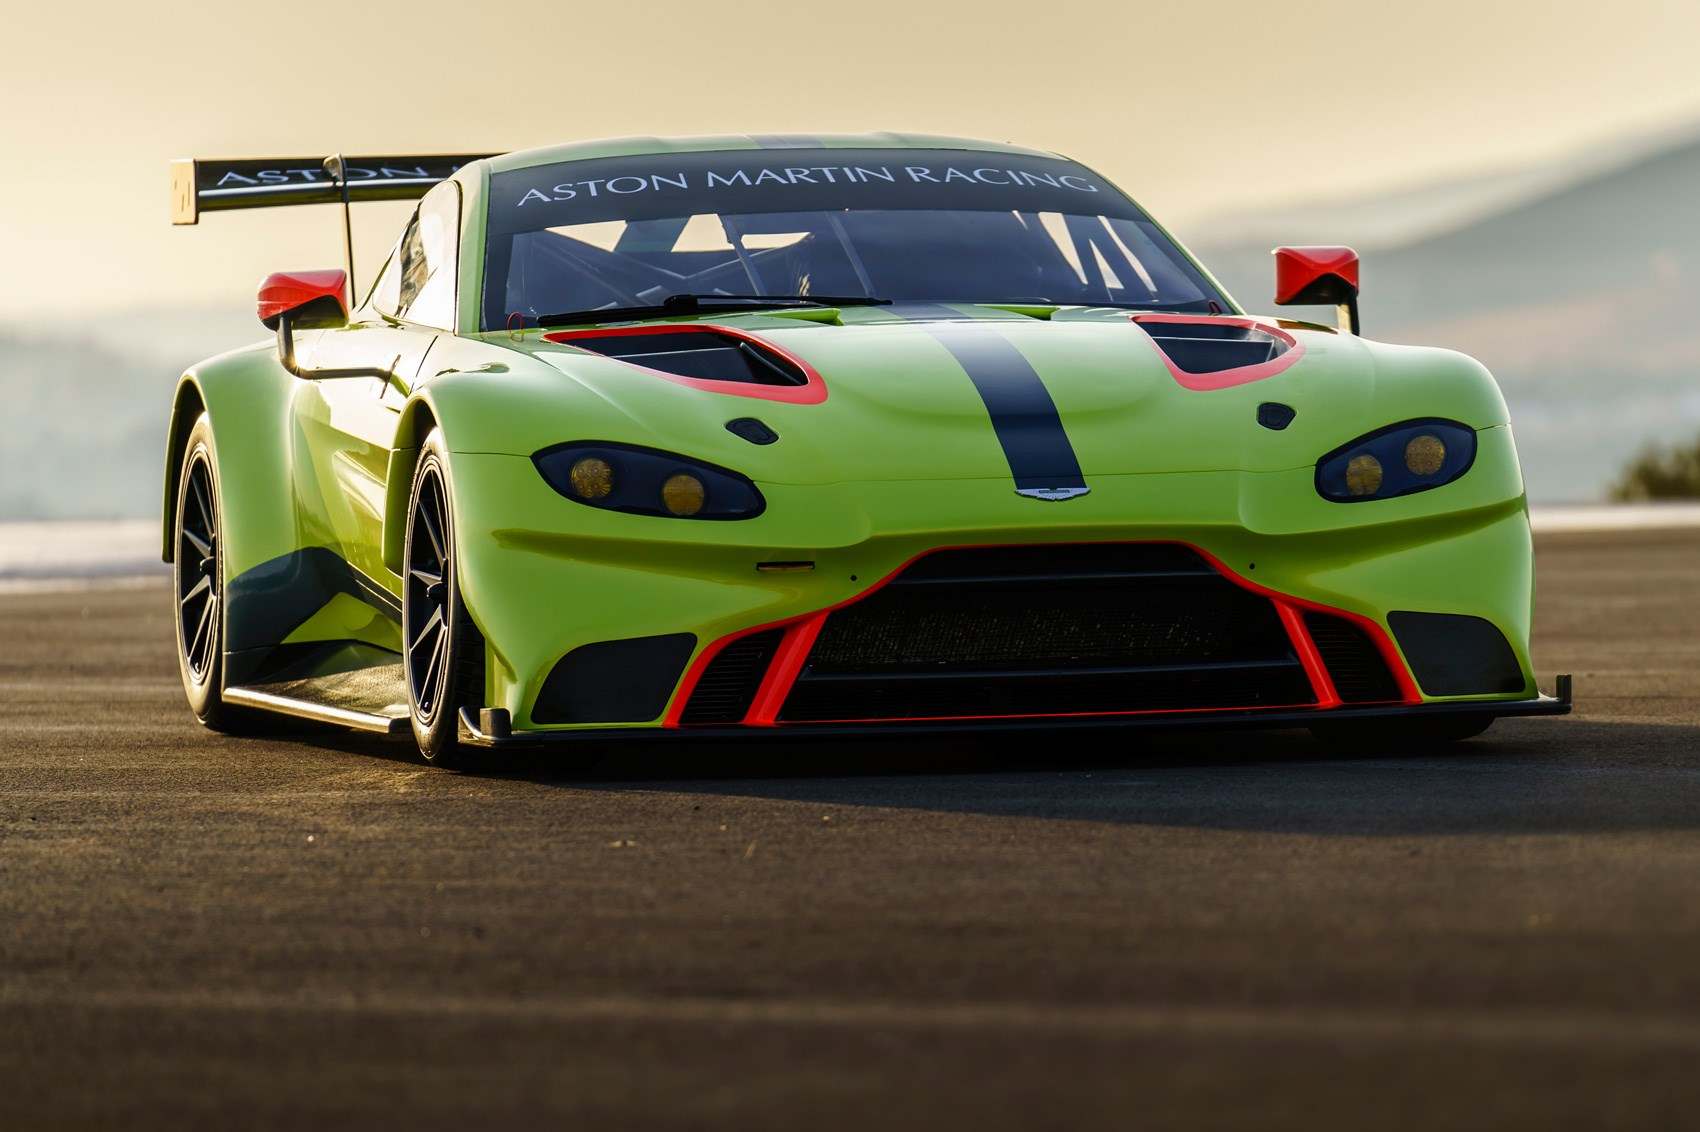 Meet The World Eater New Aston Martin Racing Vantage Gte